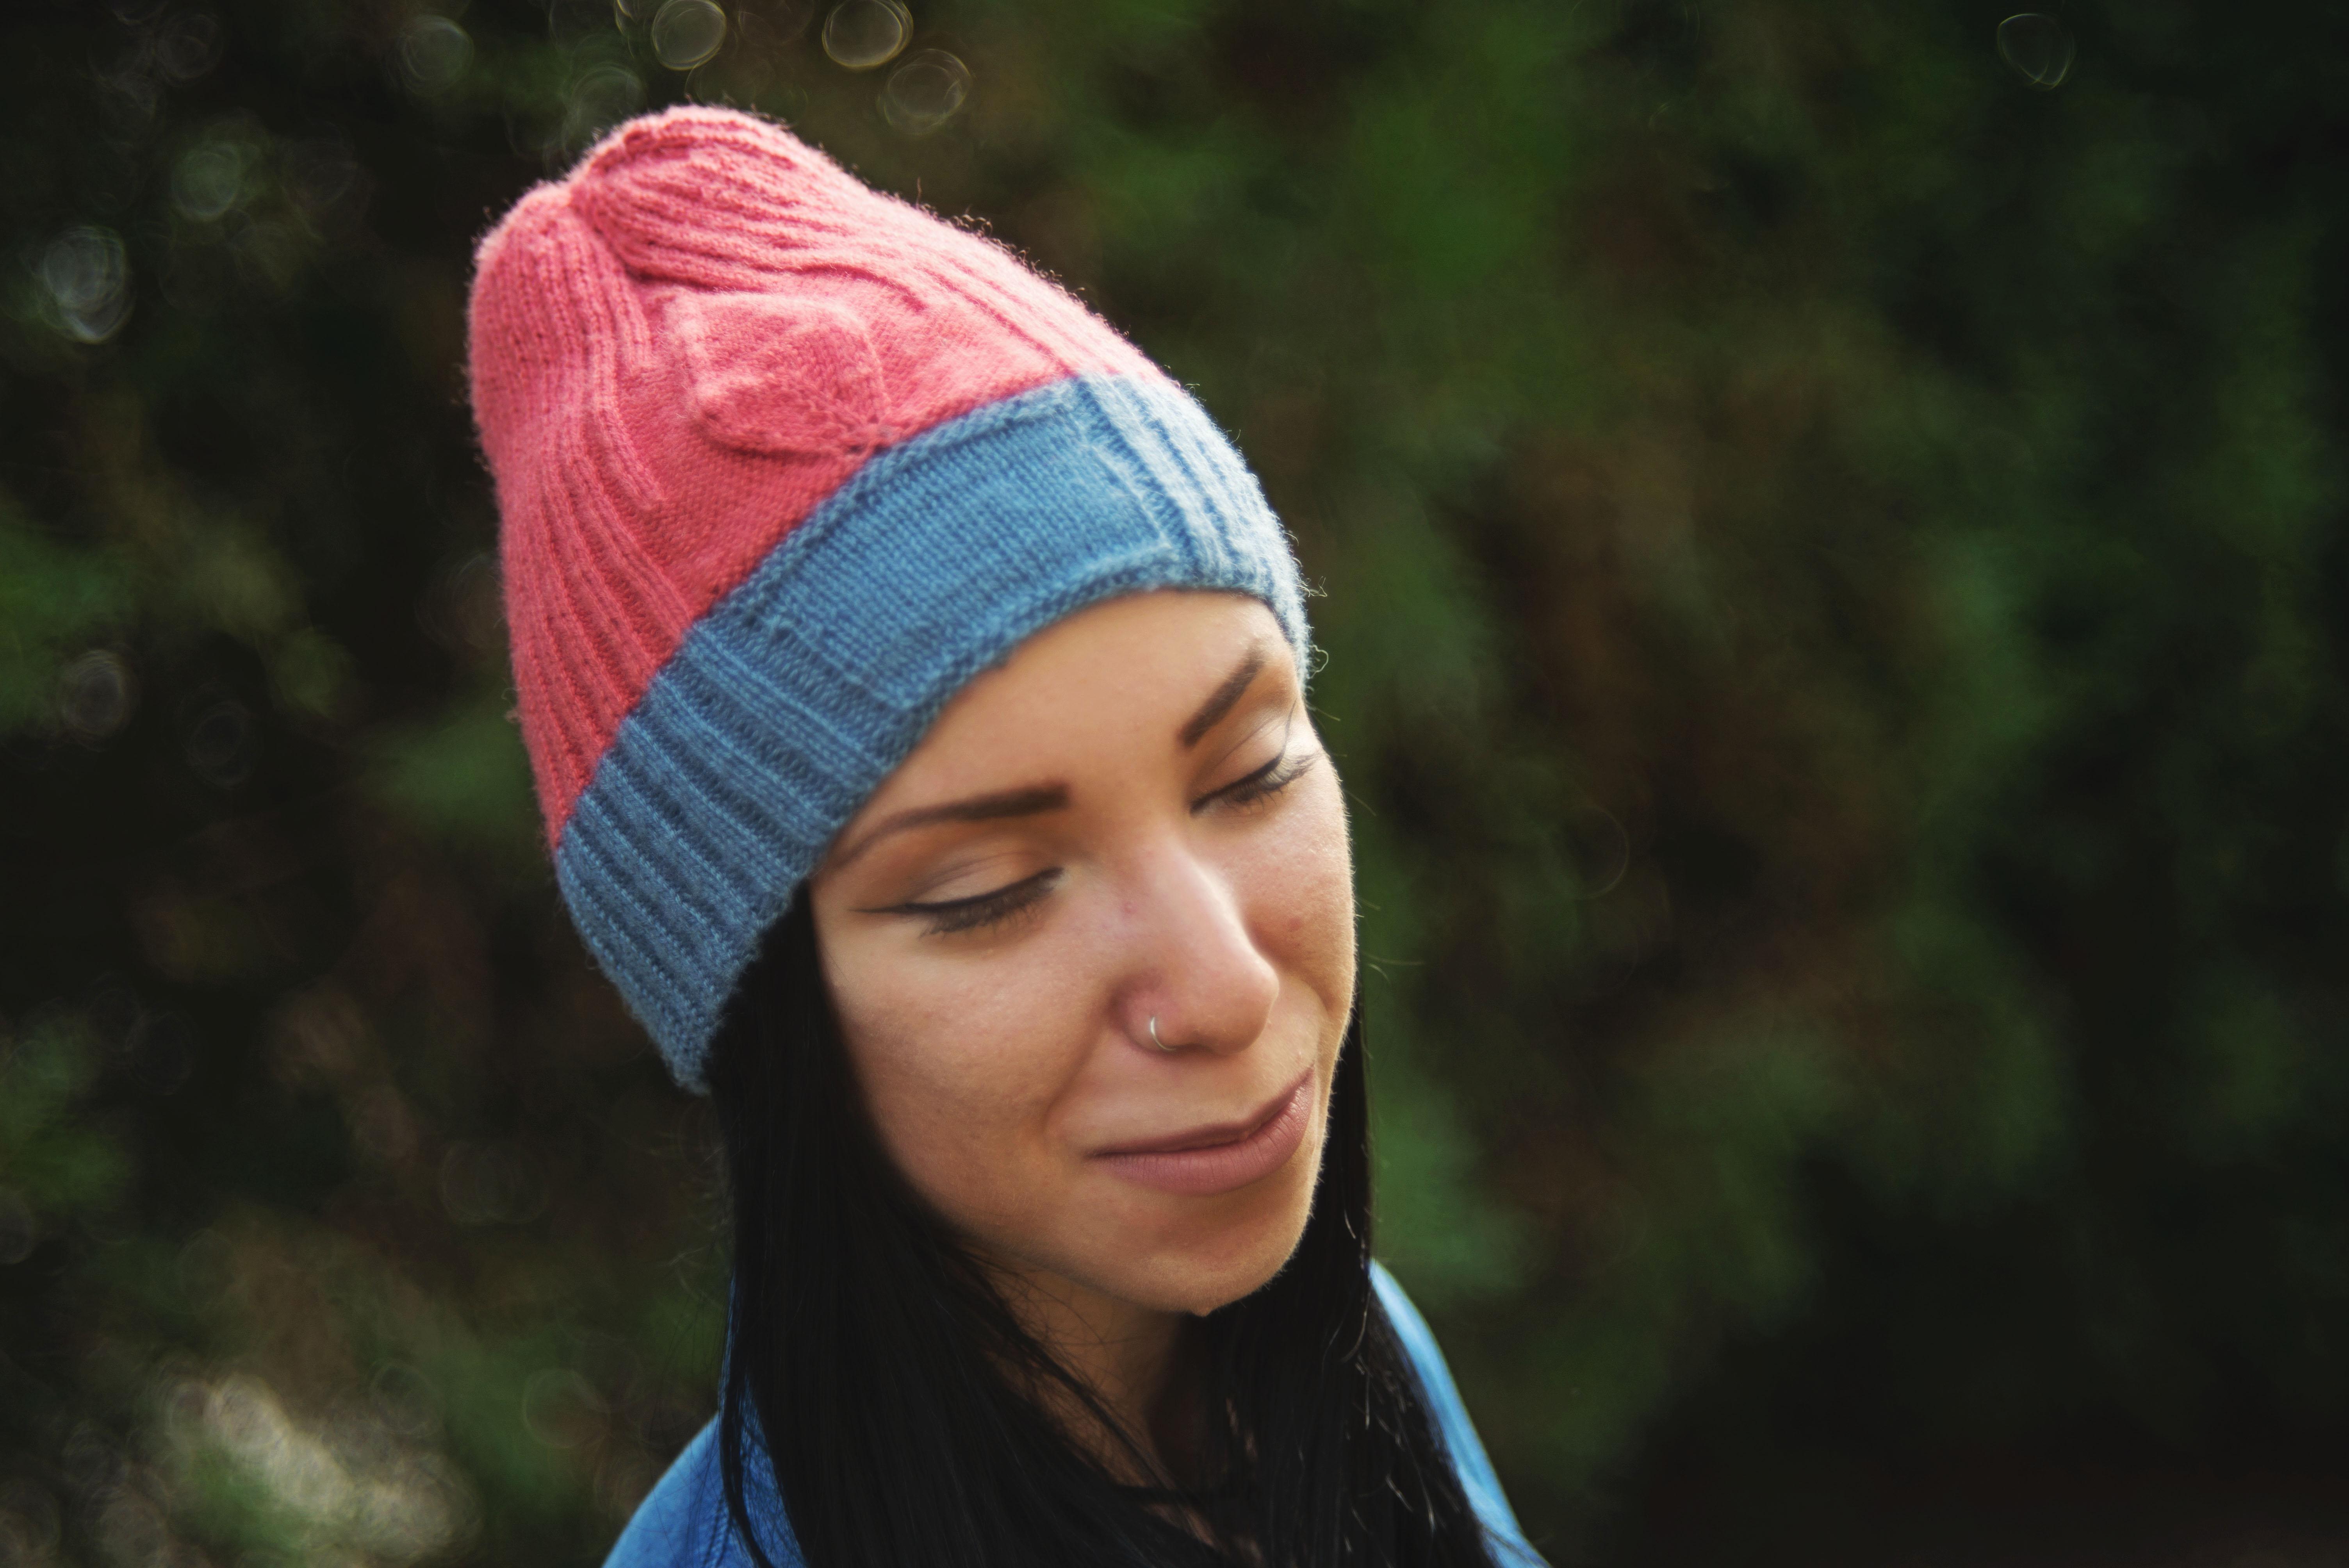 Leaf hat by knittingIlove (Barbara Nalewko)